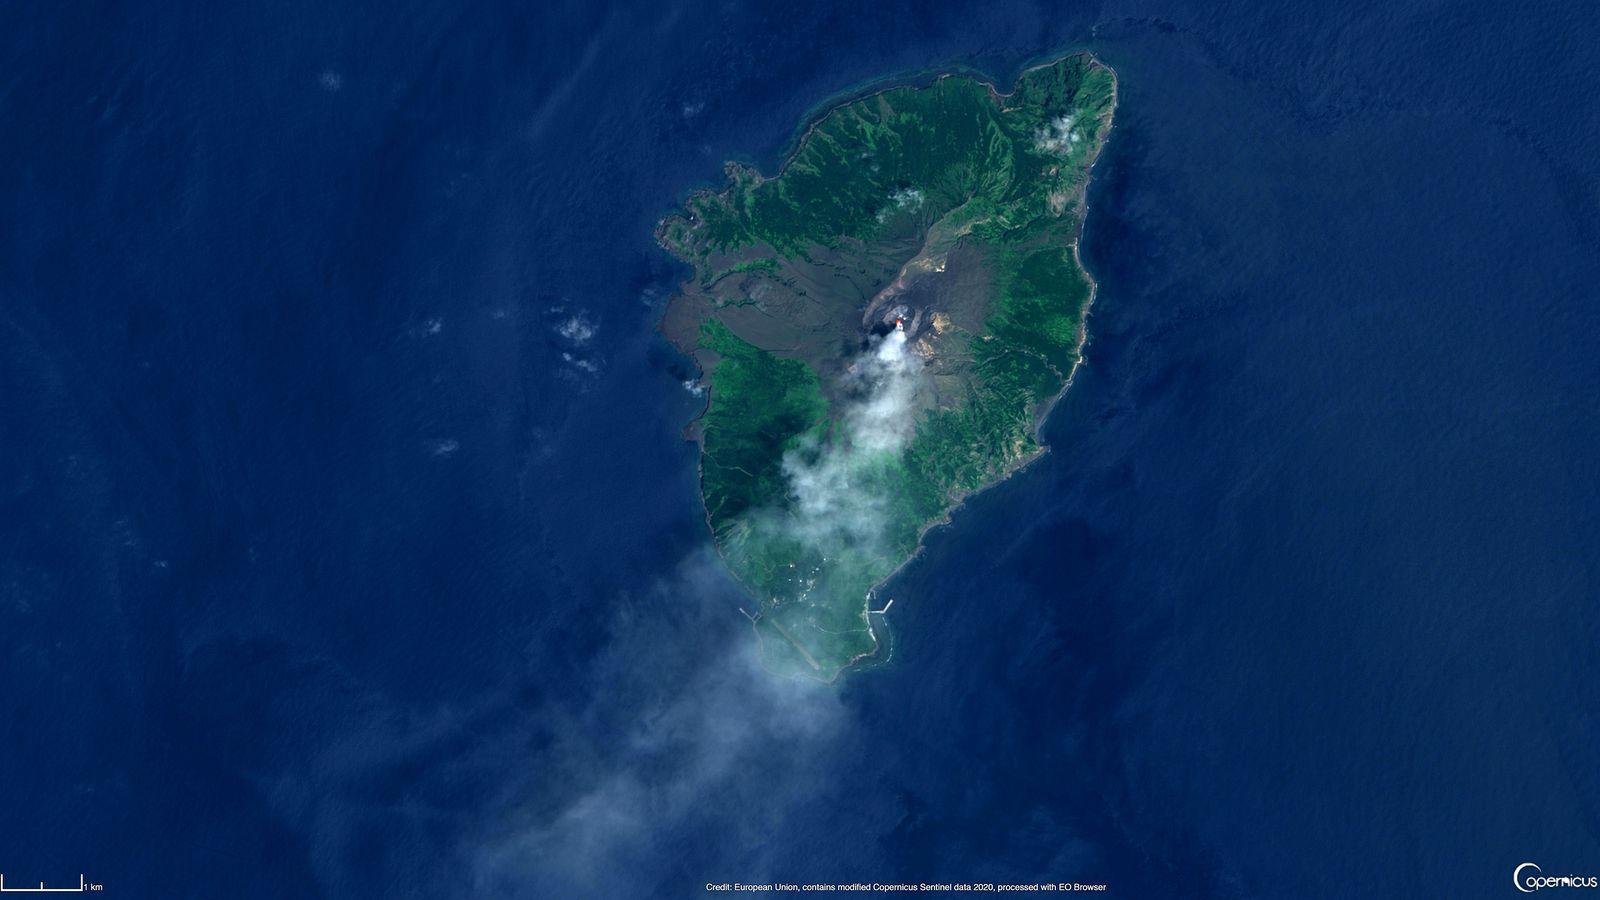 Suwanosejima - 17.08.2020 - image Sentinel-2 / EO browser / Copernicus  - un clic pour agrandir